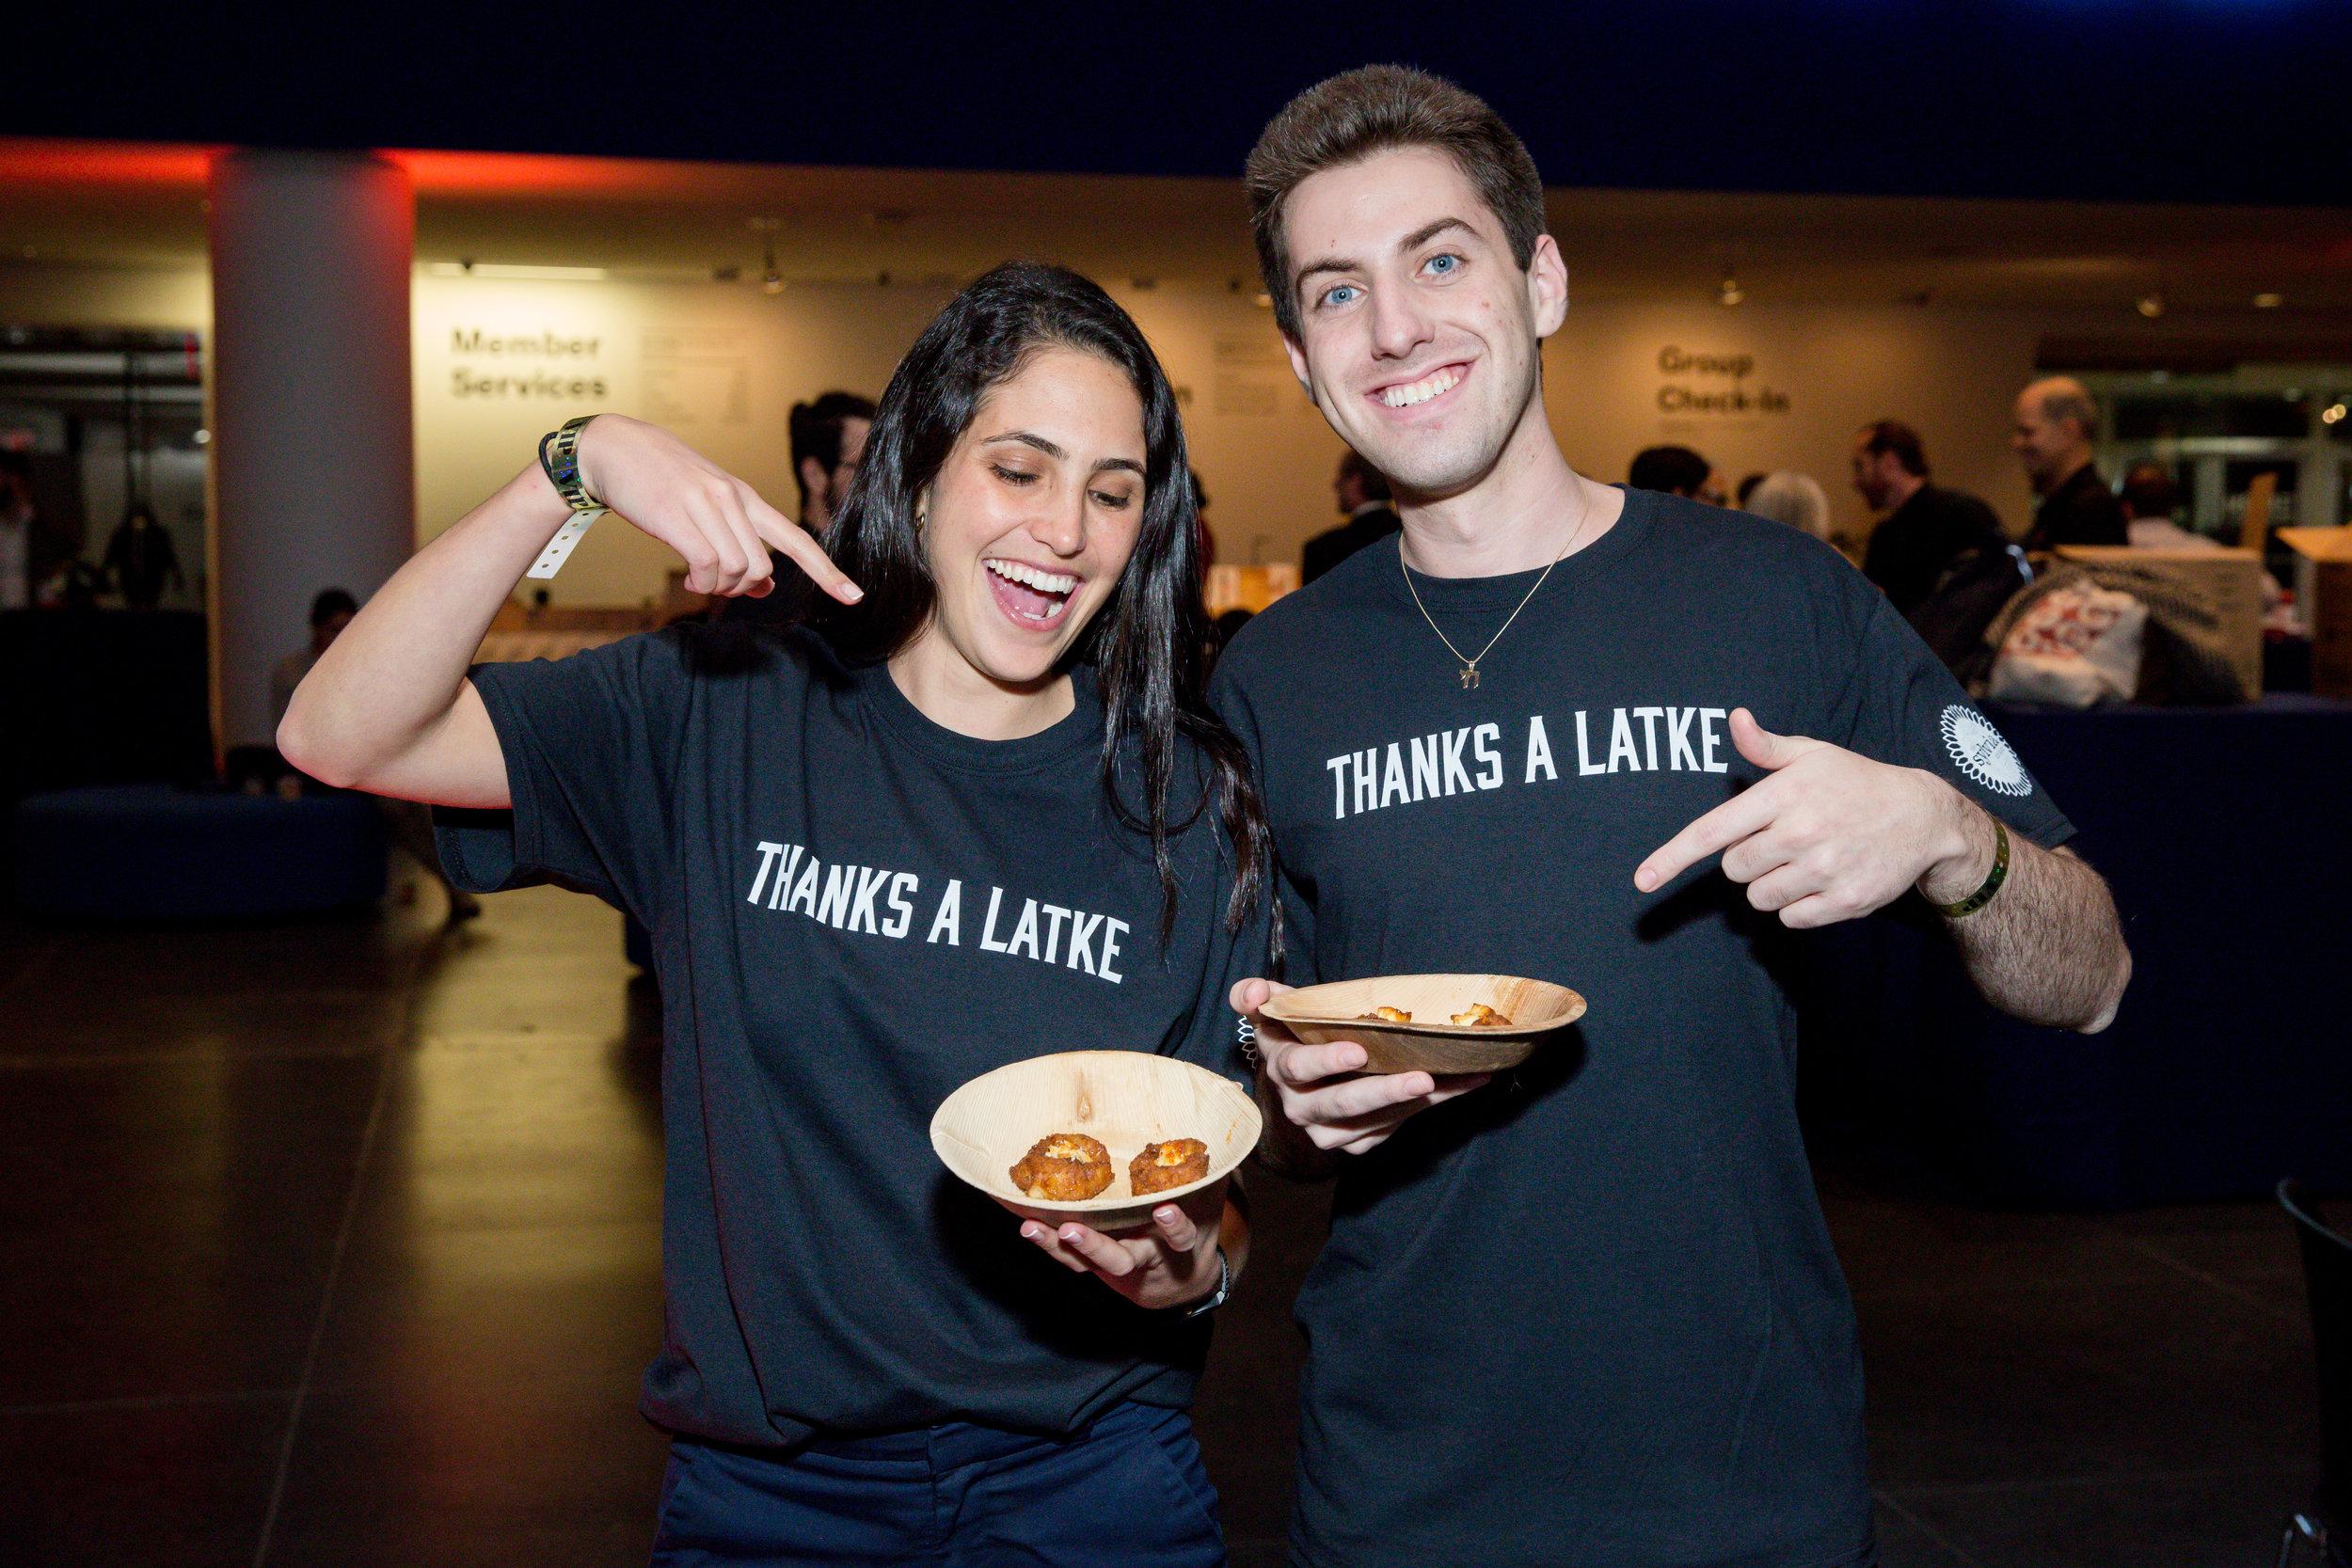 Latke Festival 2018-Eric Vitale Photography-20.jpg